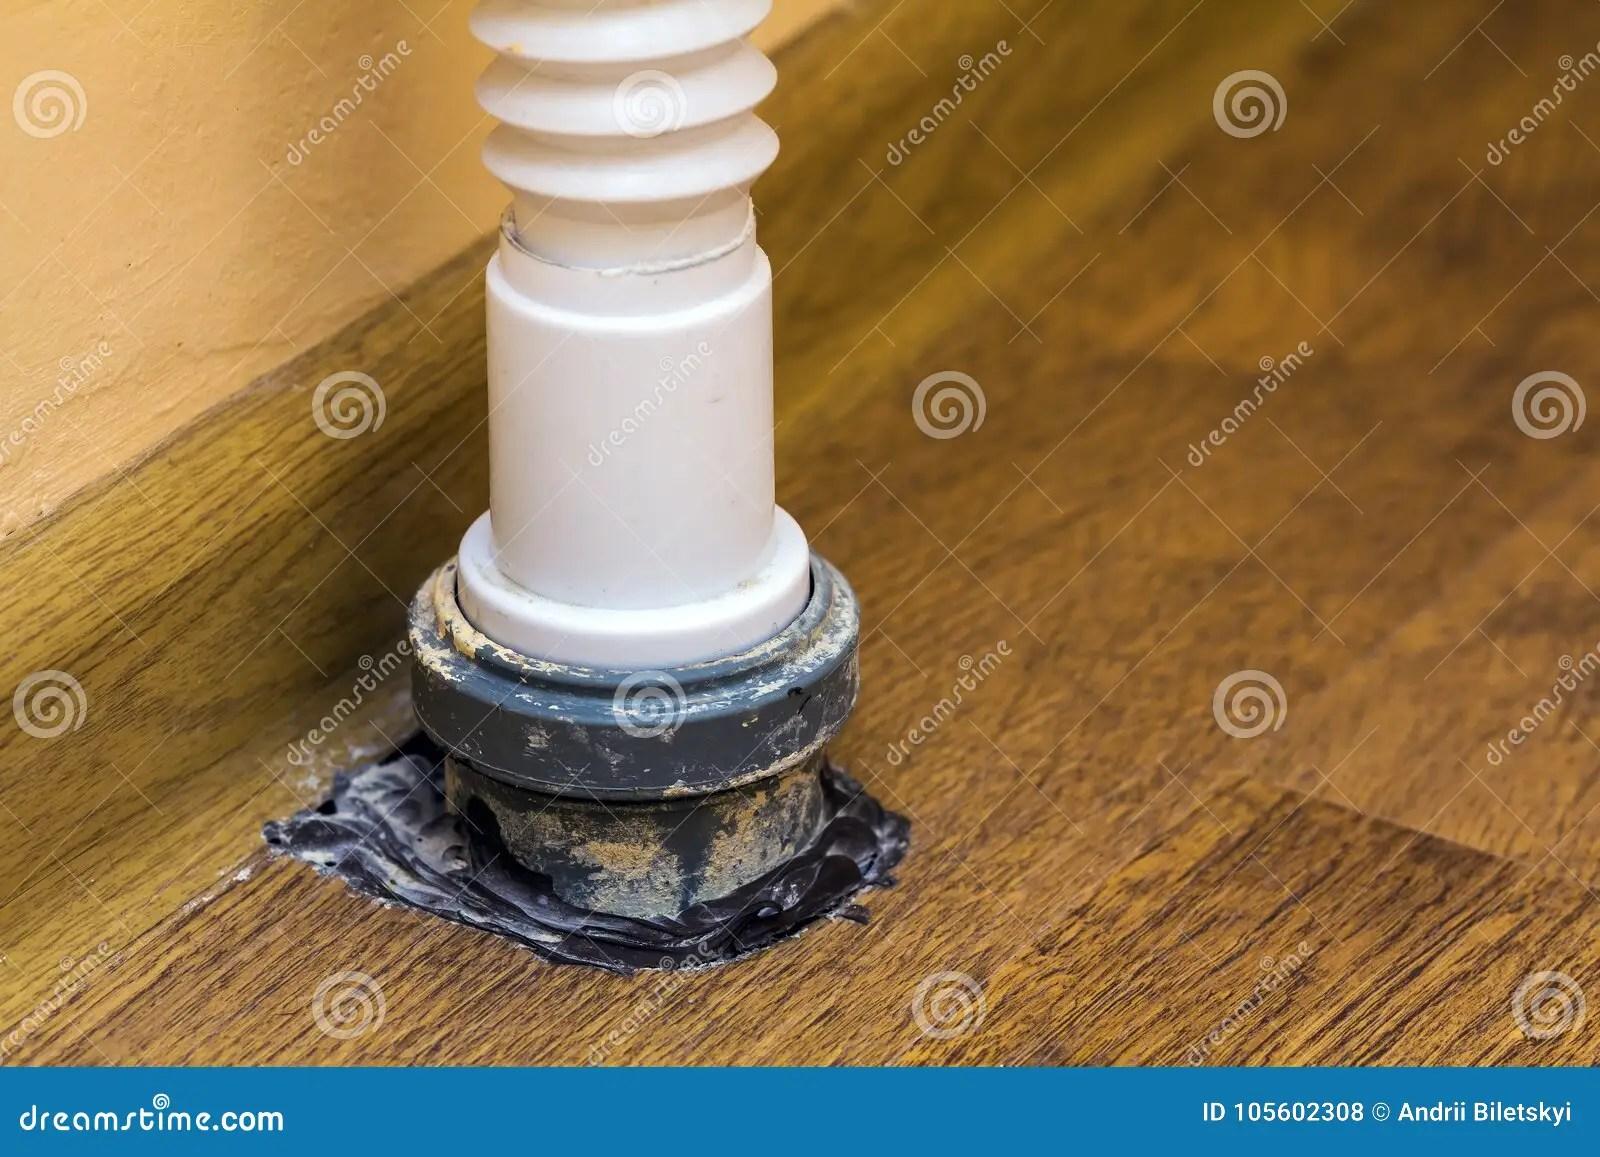 kitchen sink drain pipe bridge faucet 下水道在厨房水槽下的排水管库存照片 图片包括有管道工 运行 不锈 下水道在厨房水槽下的排水管